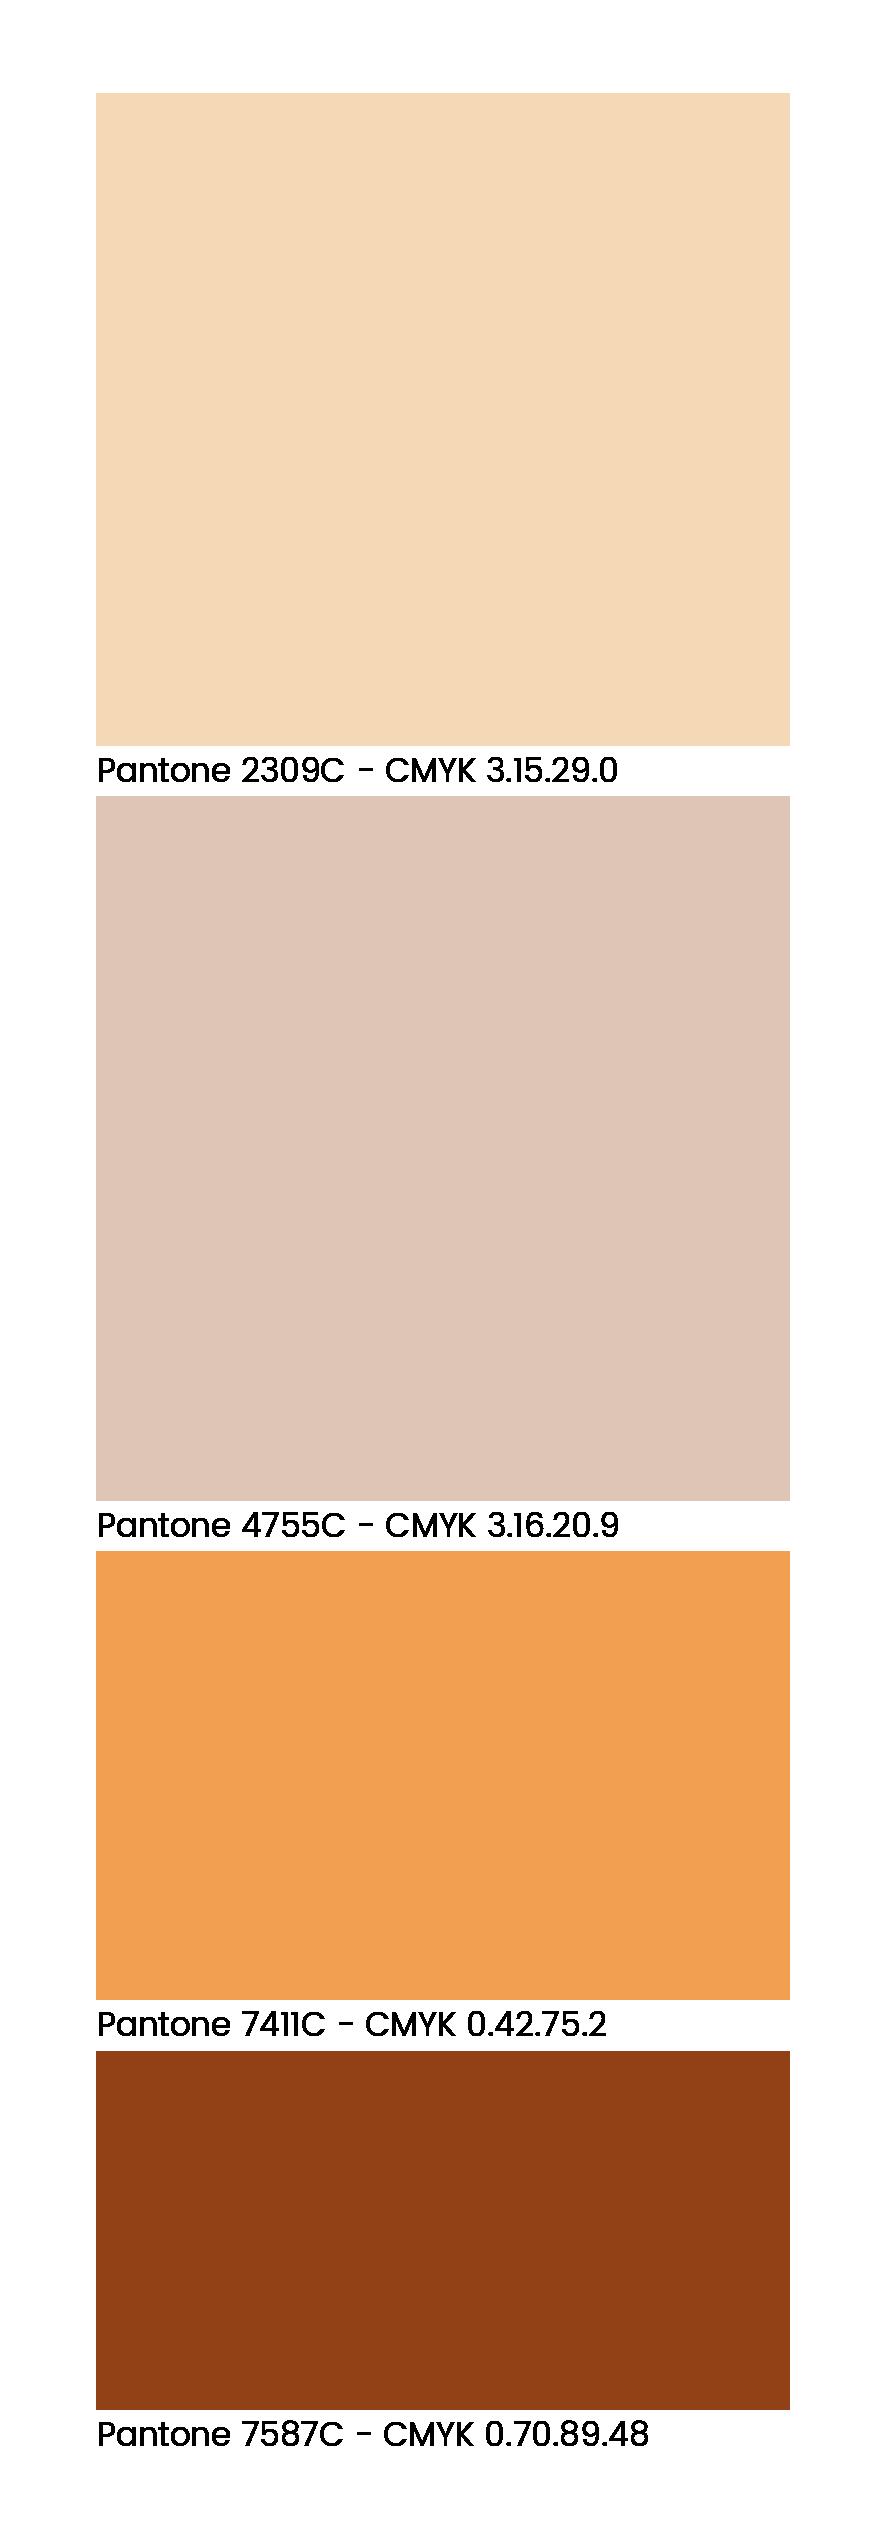 palette_1_artisanat.png